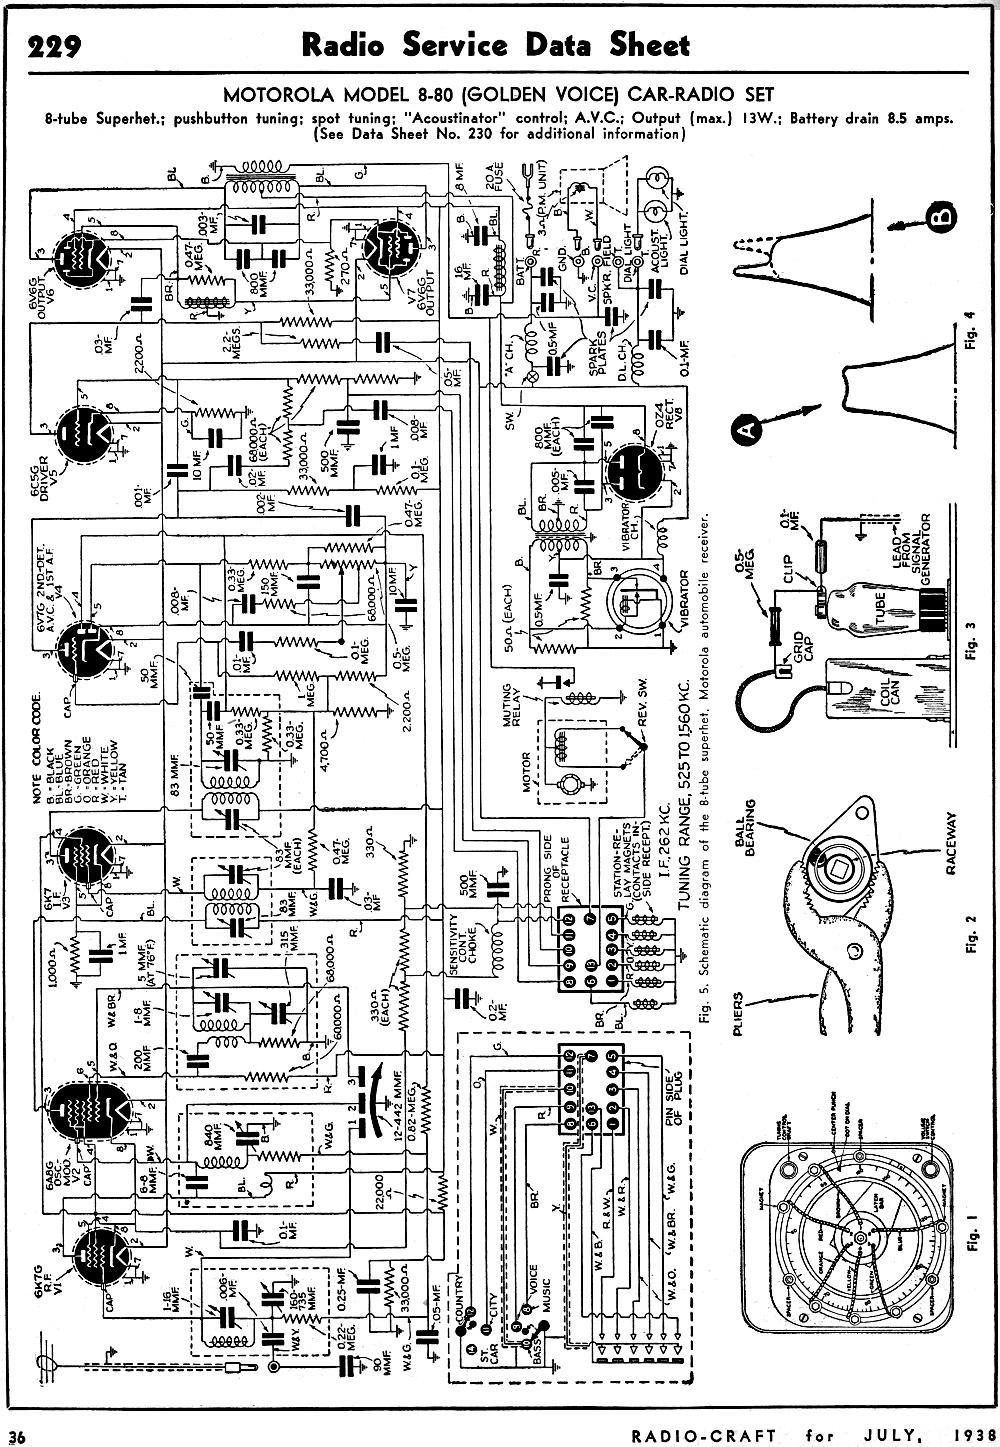 Discount car stereo maintenance schedules user manuals ford sirius radio headset view 1 array motorola model 8 80 golden voice car radio set radio service data rh rfcafe fandeluxe Images